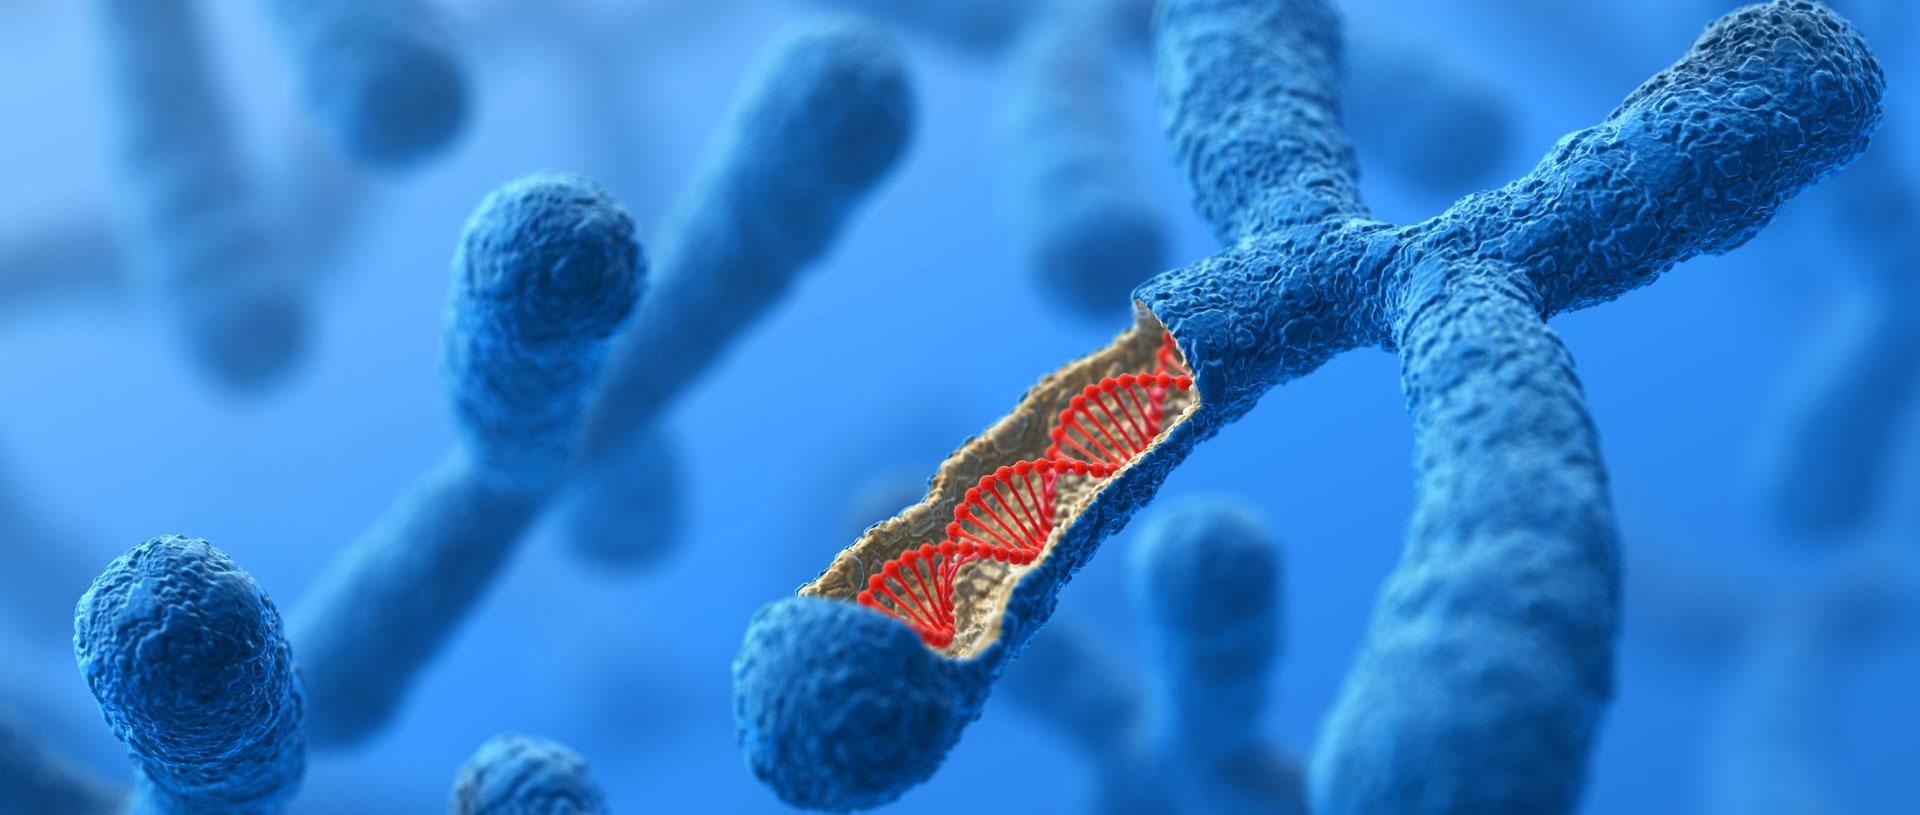 Genetics may explain up to 25% of same-sex behavior, giant analysis reveals...